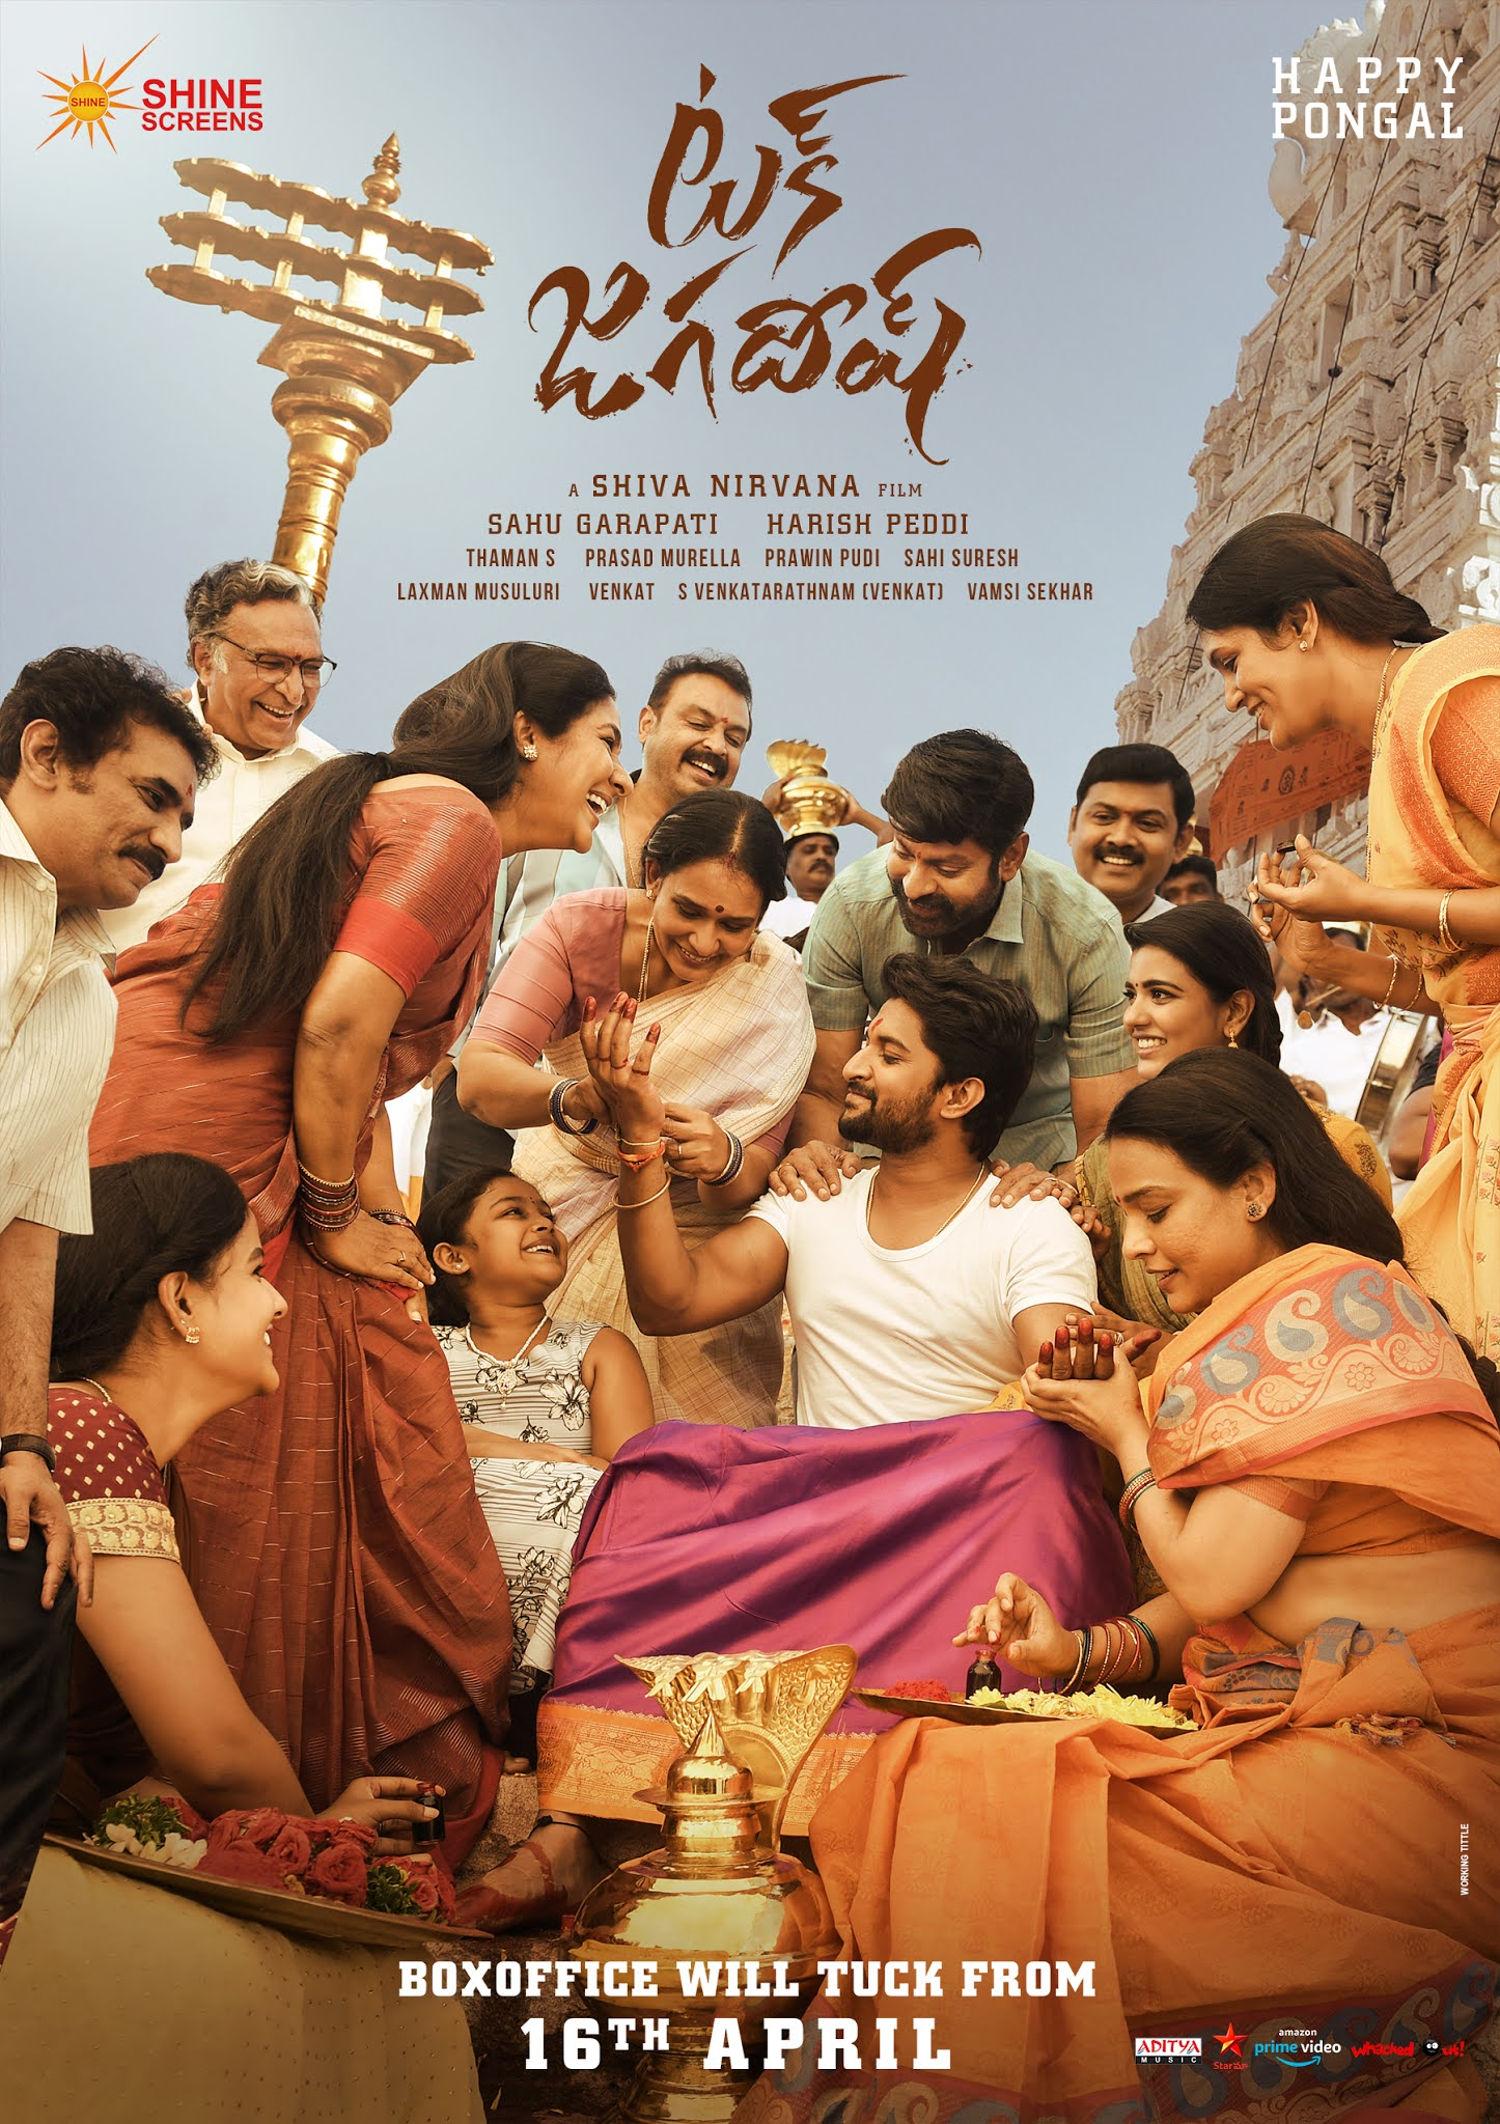 Nani Tuck Jagadish Movie Release On 16th April 2021 Poster HD